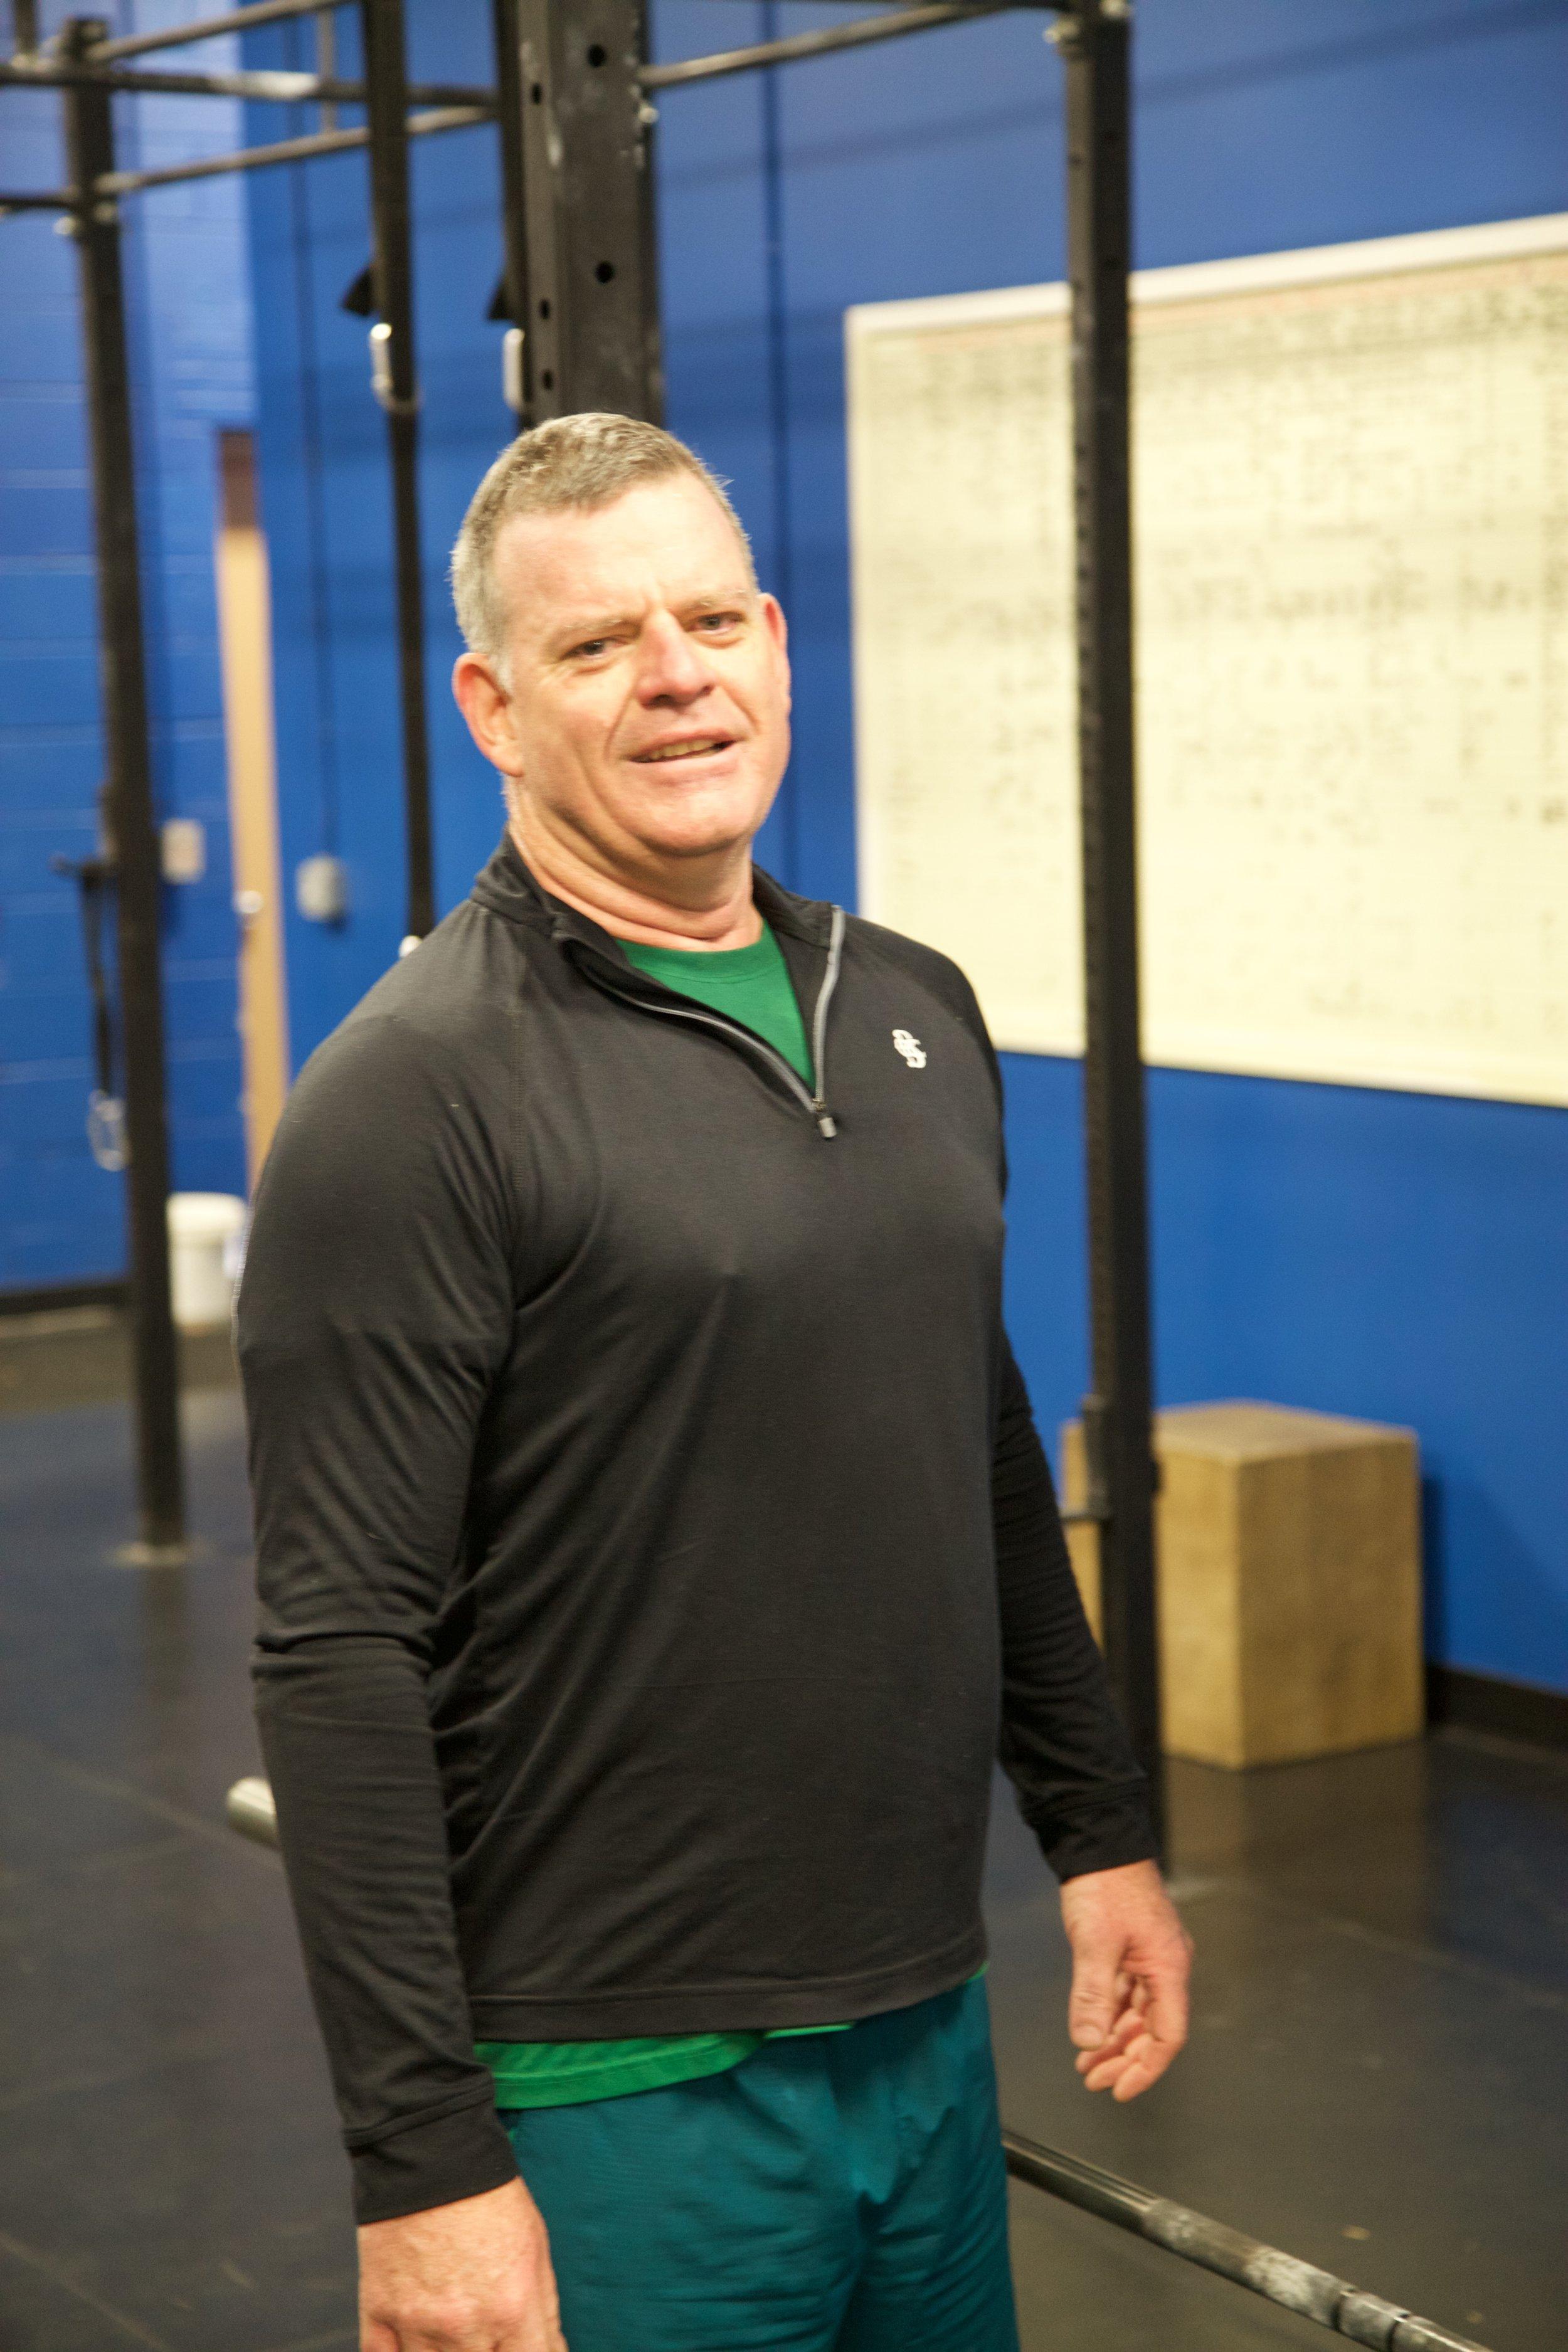 Sean Shallis at CrossFit Annex